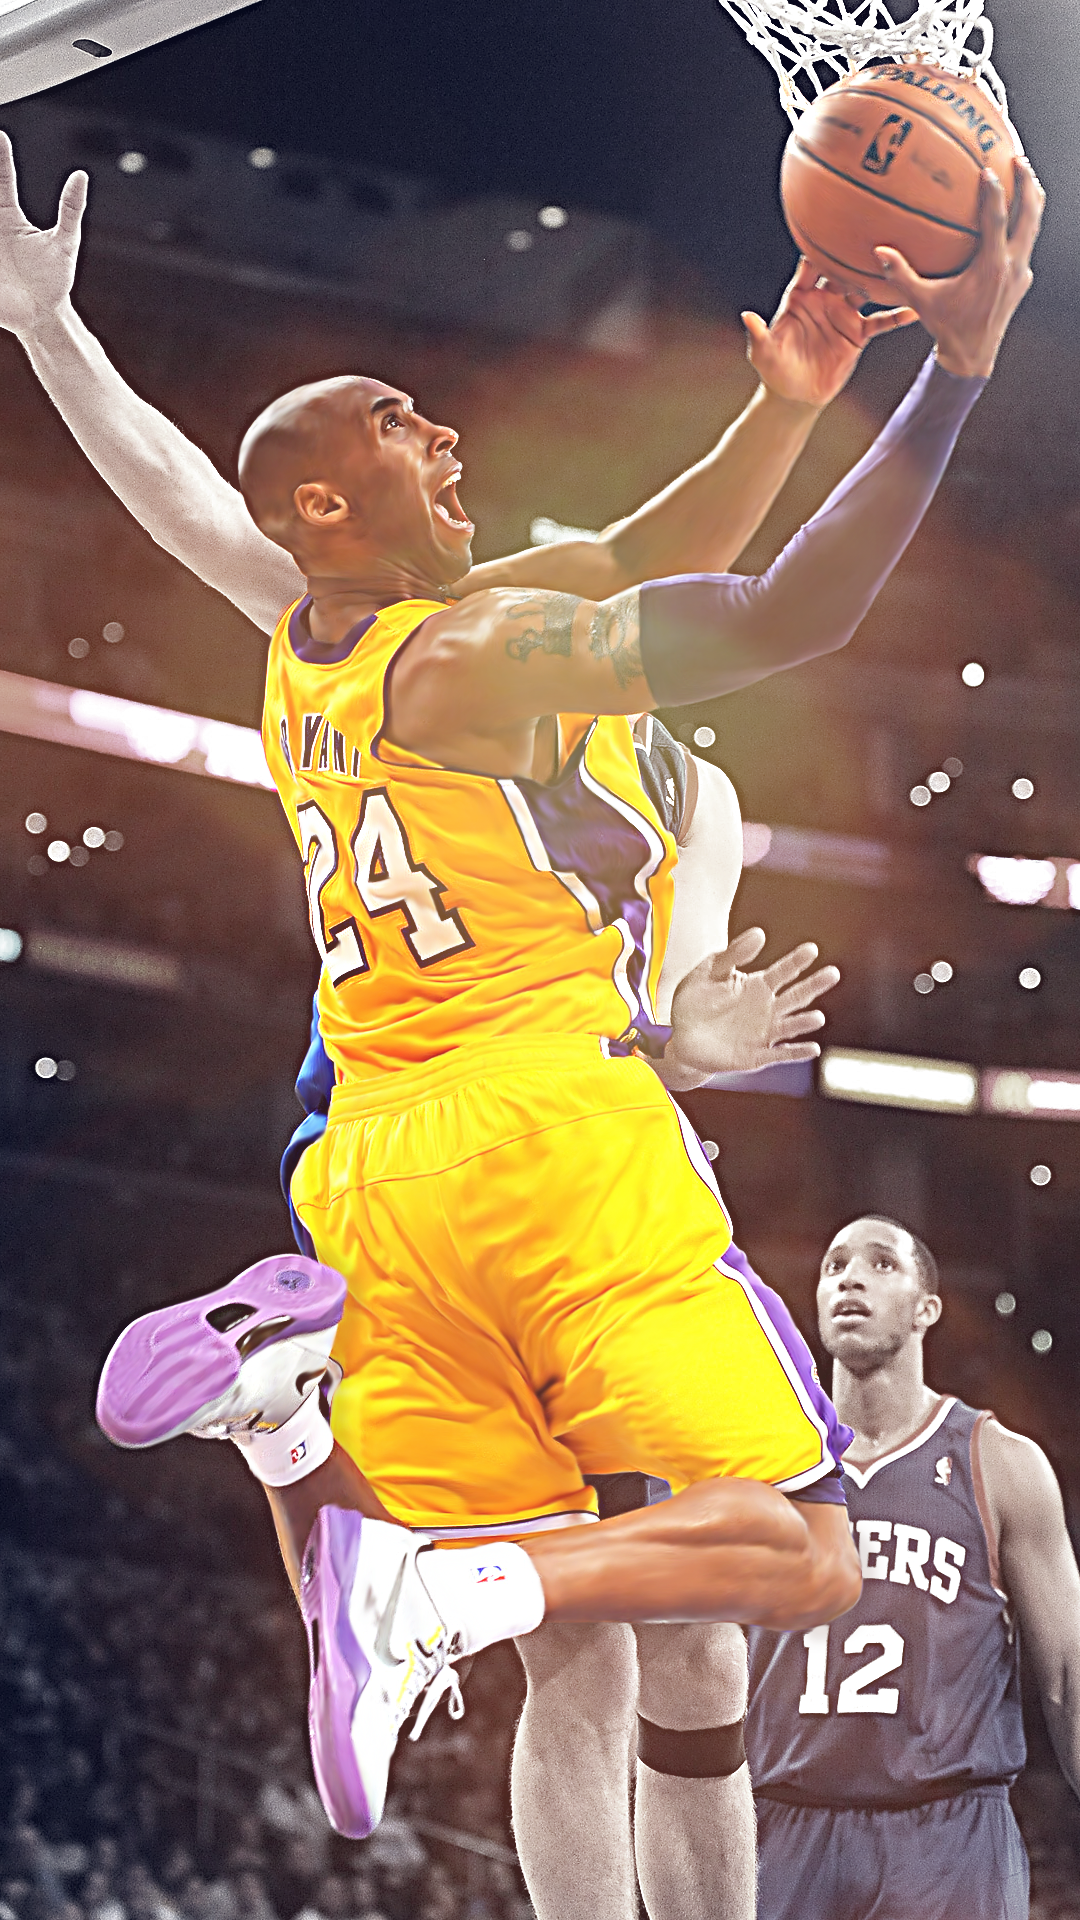 Black Mamba Kobe Bryant Background Image In 2020 Kobe Bryant Wallpaper Kobe Bryant Kobe Bryant Poster